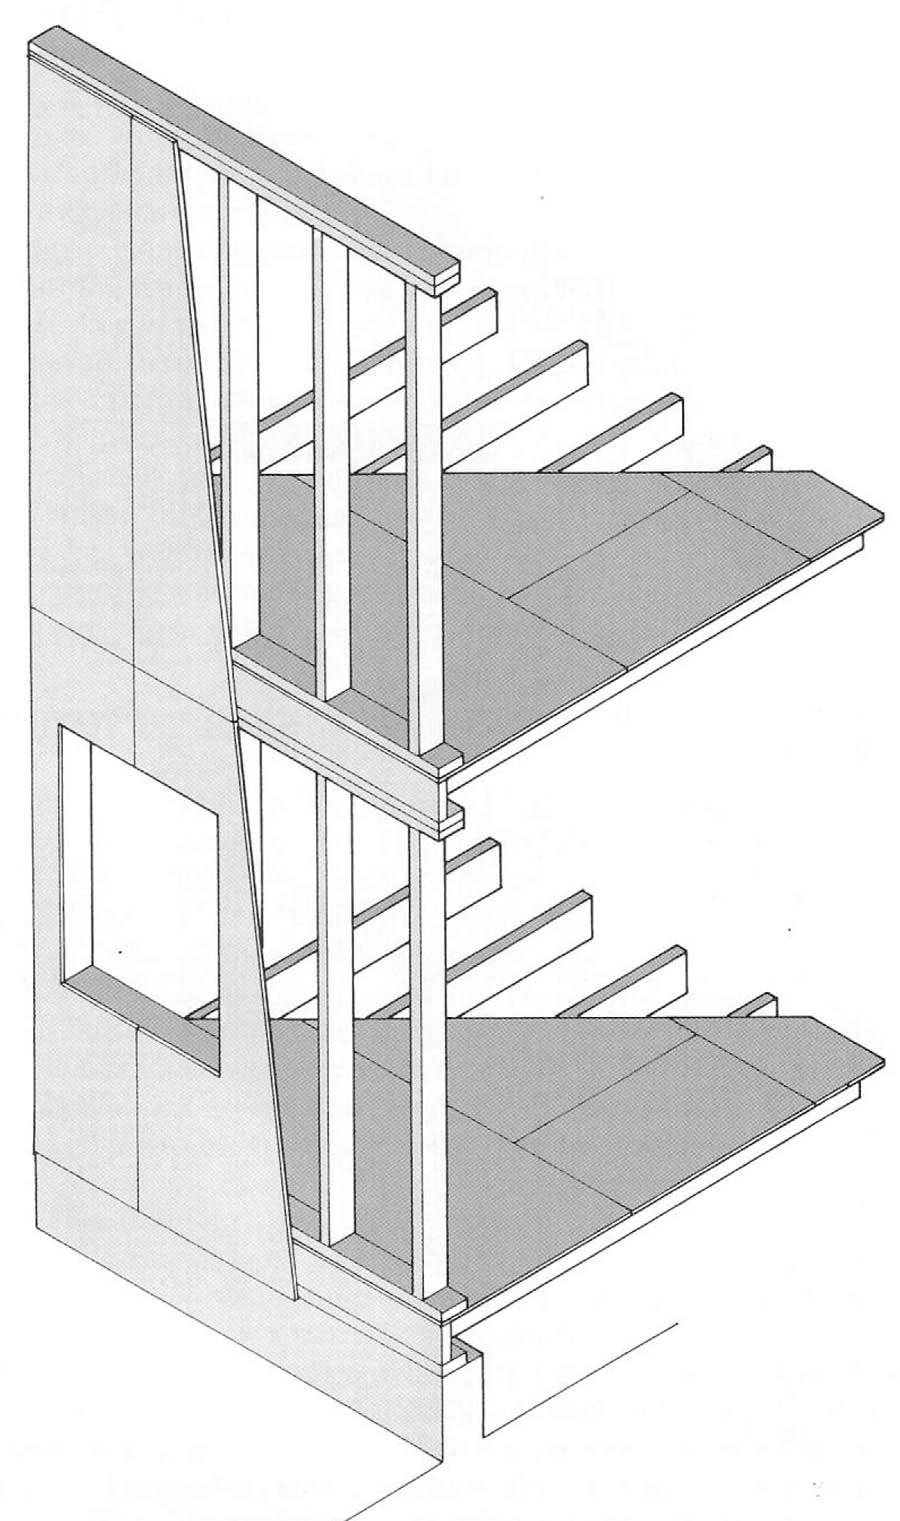 каркасная конструкция по системе Платформа